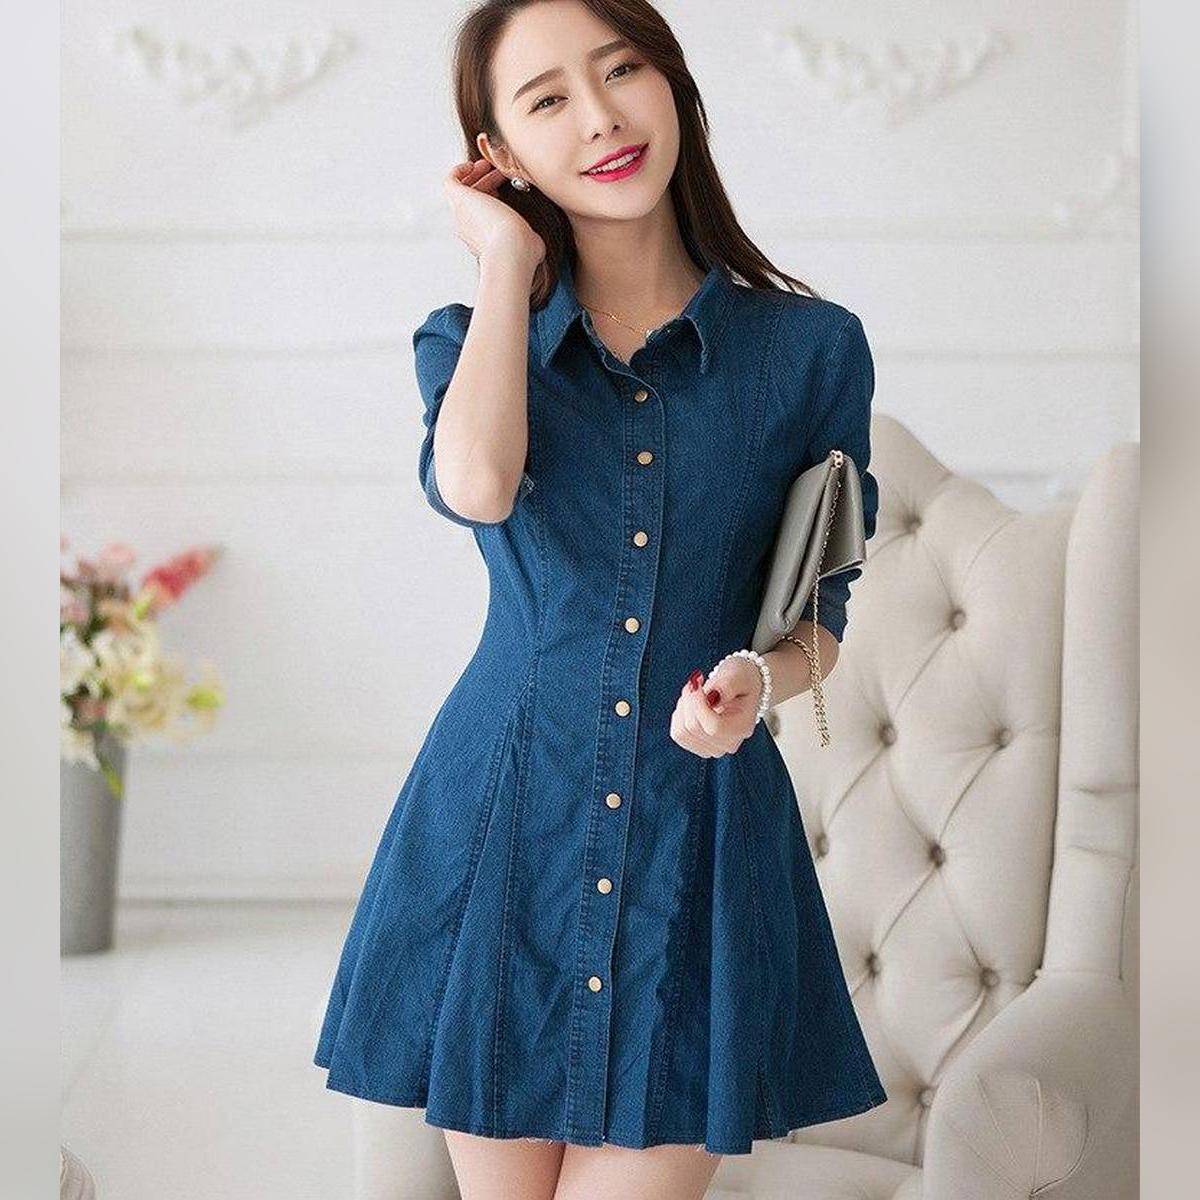 High quality Denim Shirt Dress - Turn-down Collar Girls Denim Dress Full Sleeved Long Sleeve Denim Dress - Denim Shirt For Women - New Style Denim Shirt